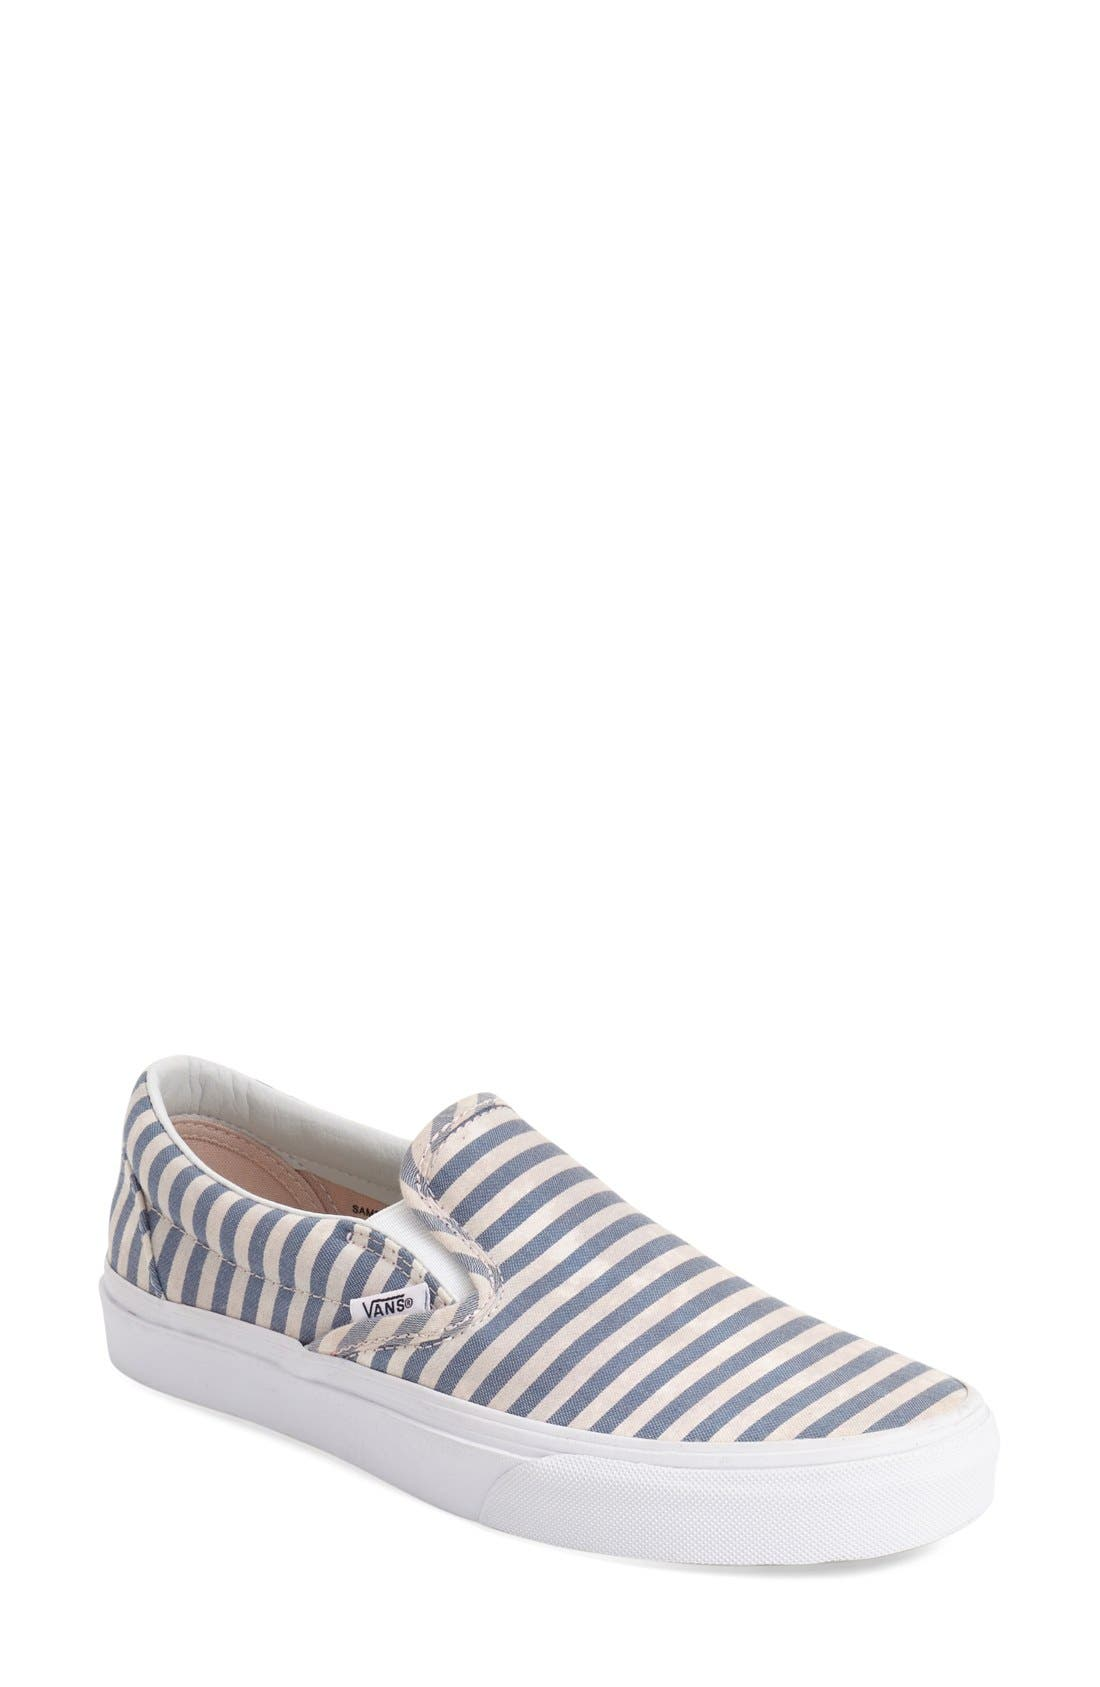 ,                             Classic Slip-On Sneaker,                             Main thumbnail 356, color,                             410